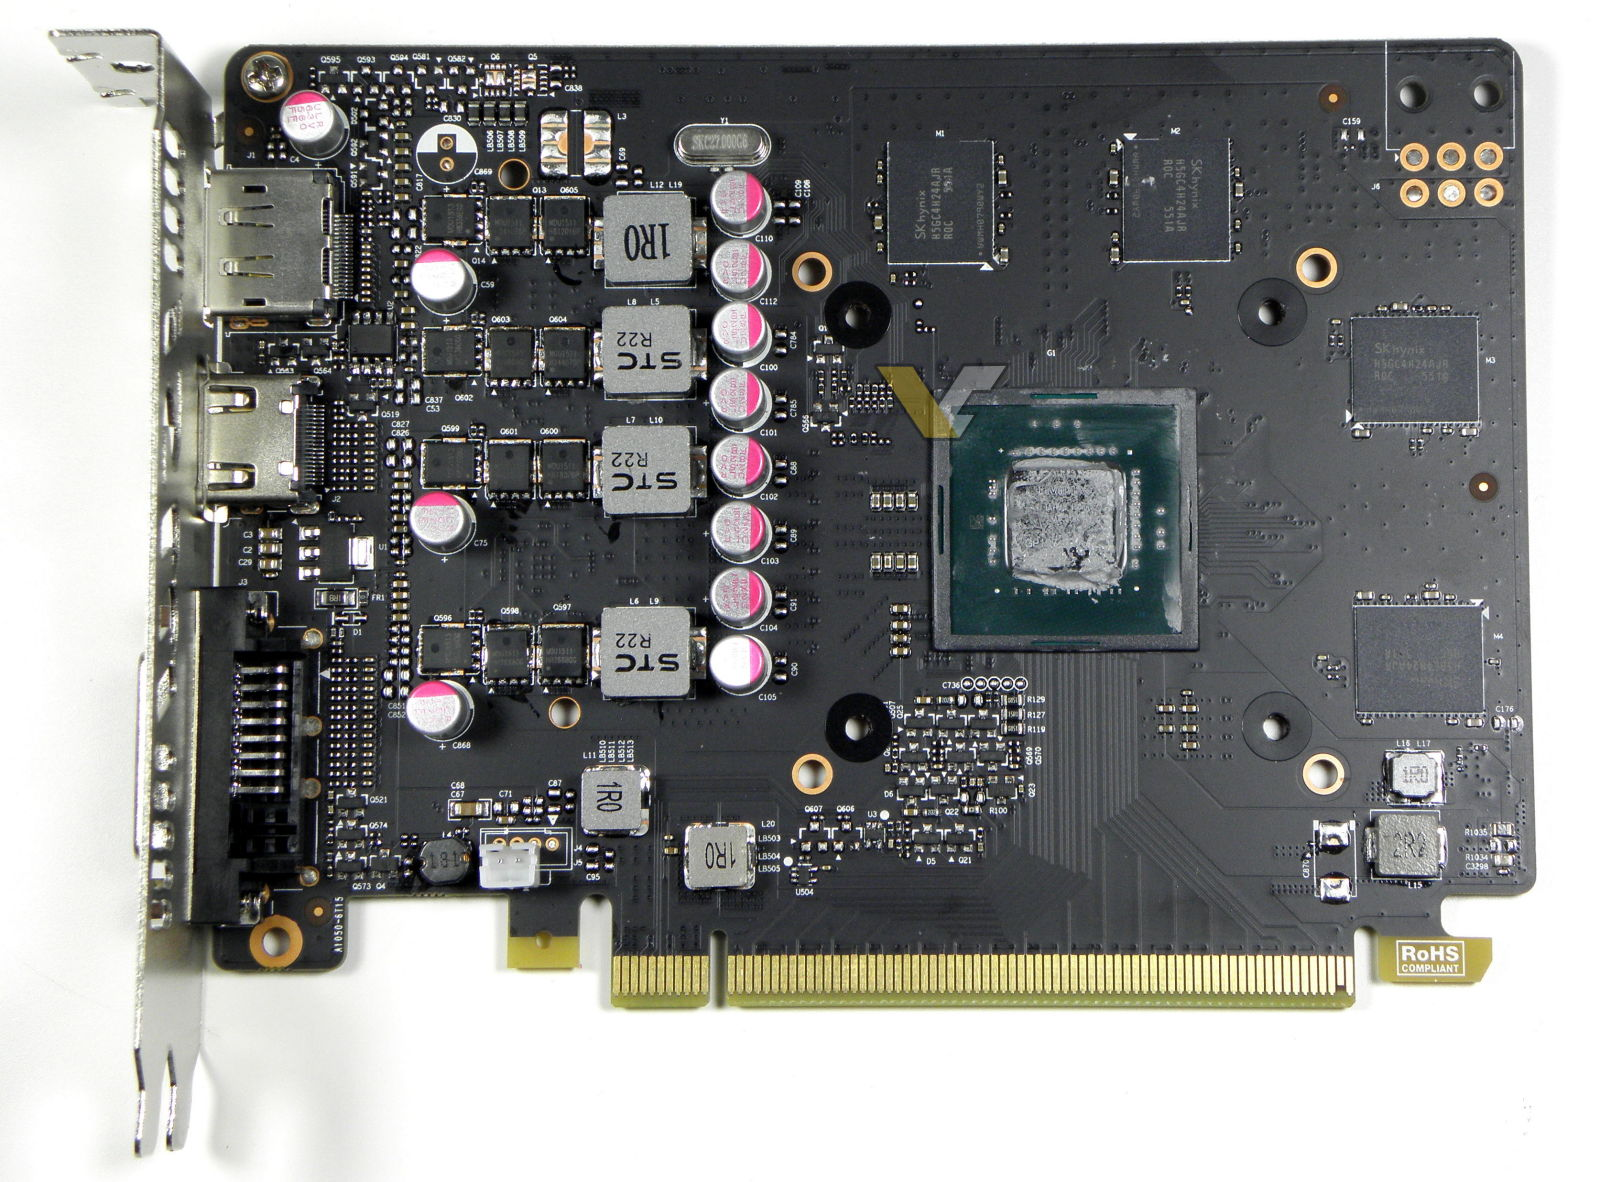 MSI GeForce GTX 1050 Ti GAMING X 4G & MSI GTX 1050 2G OC Review